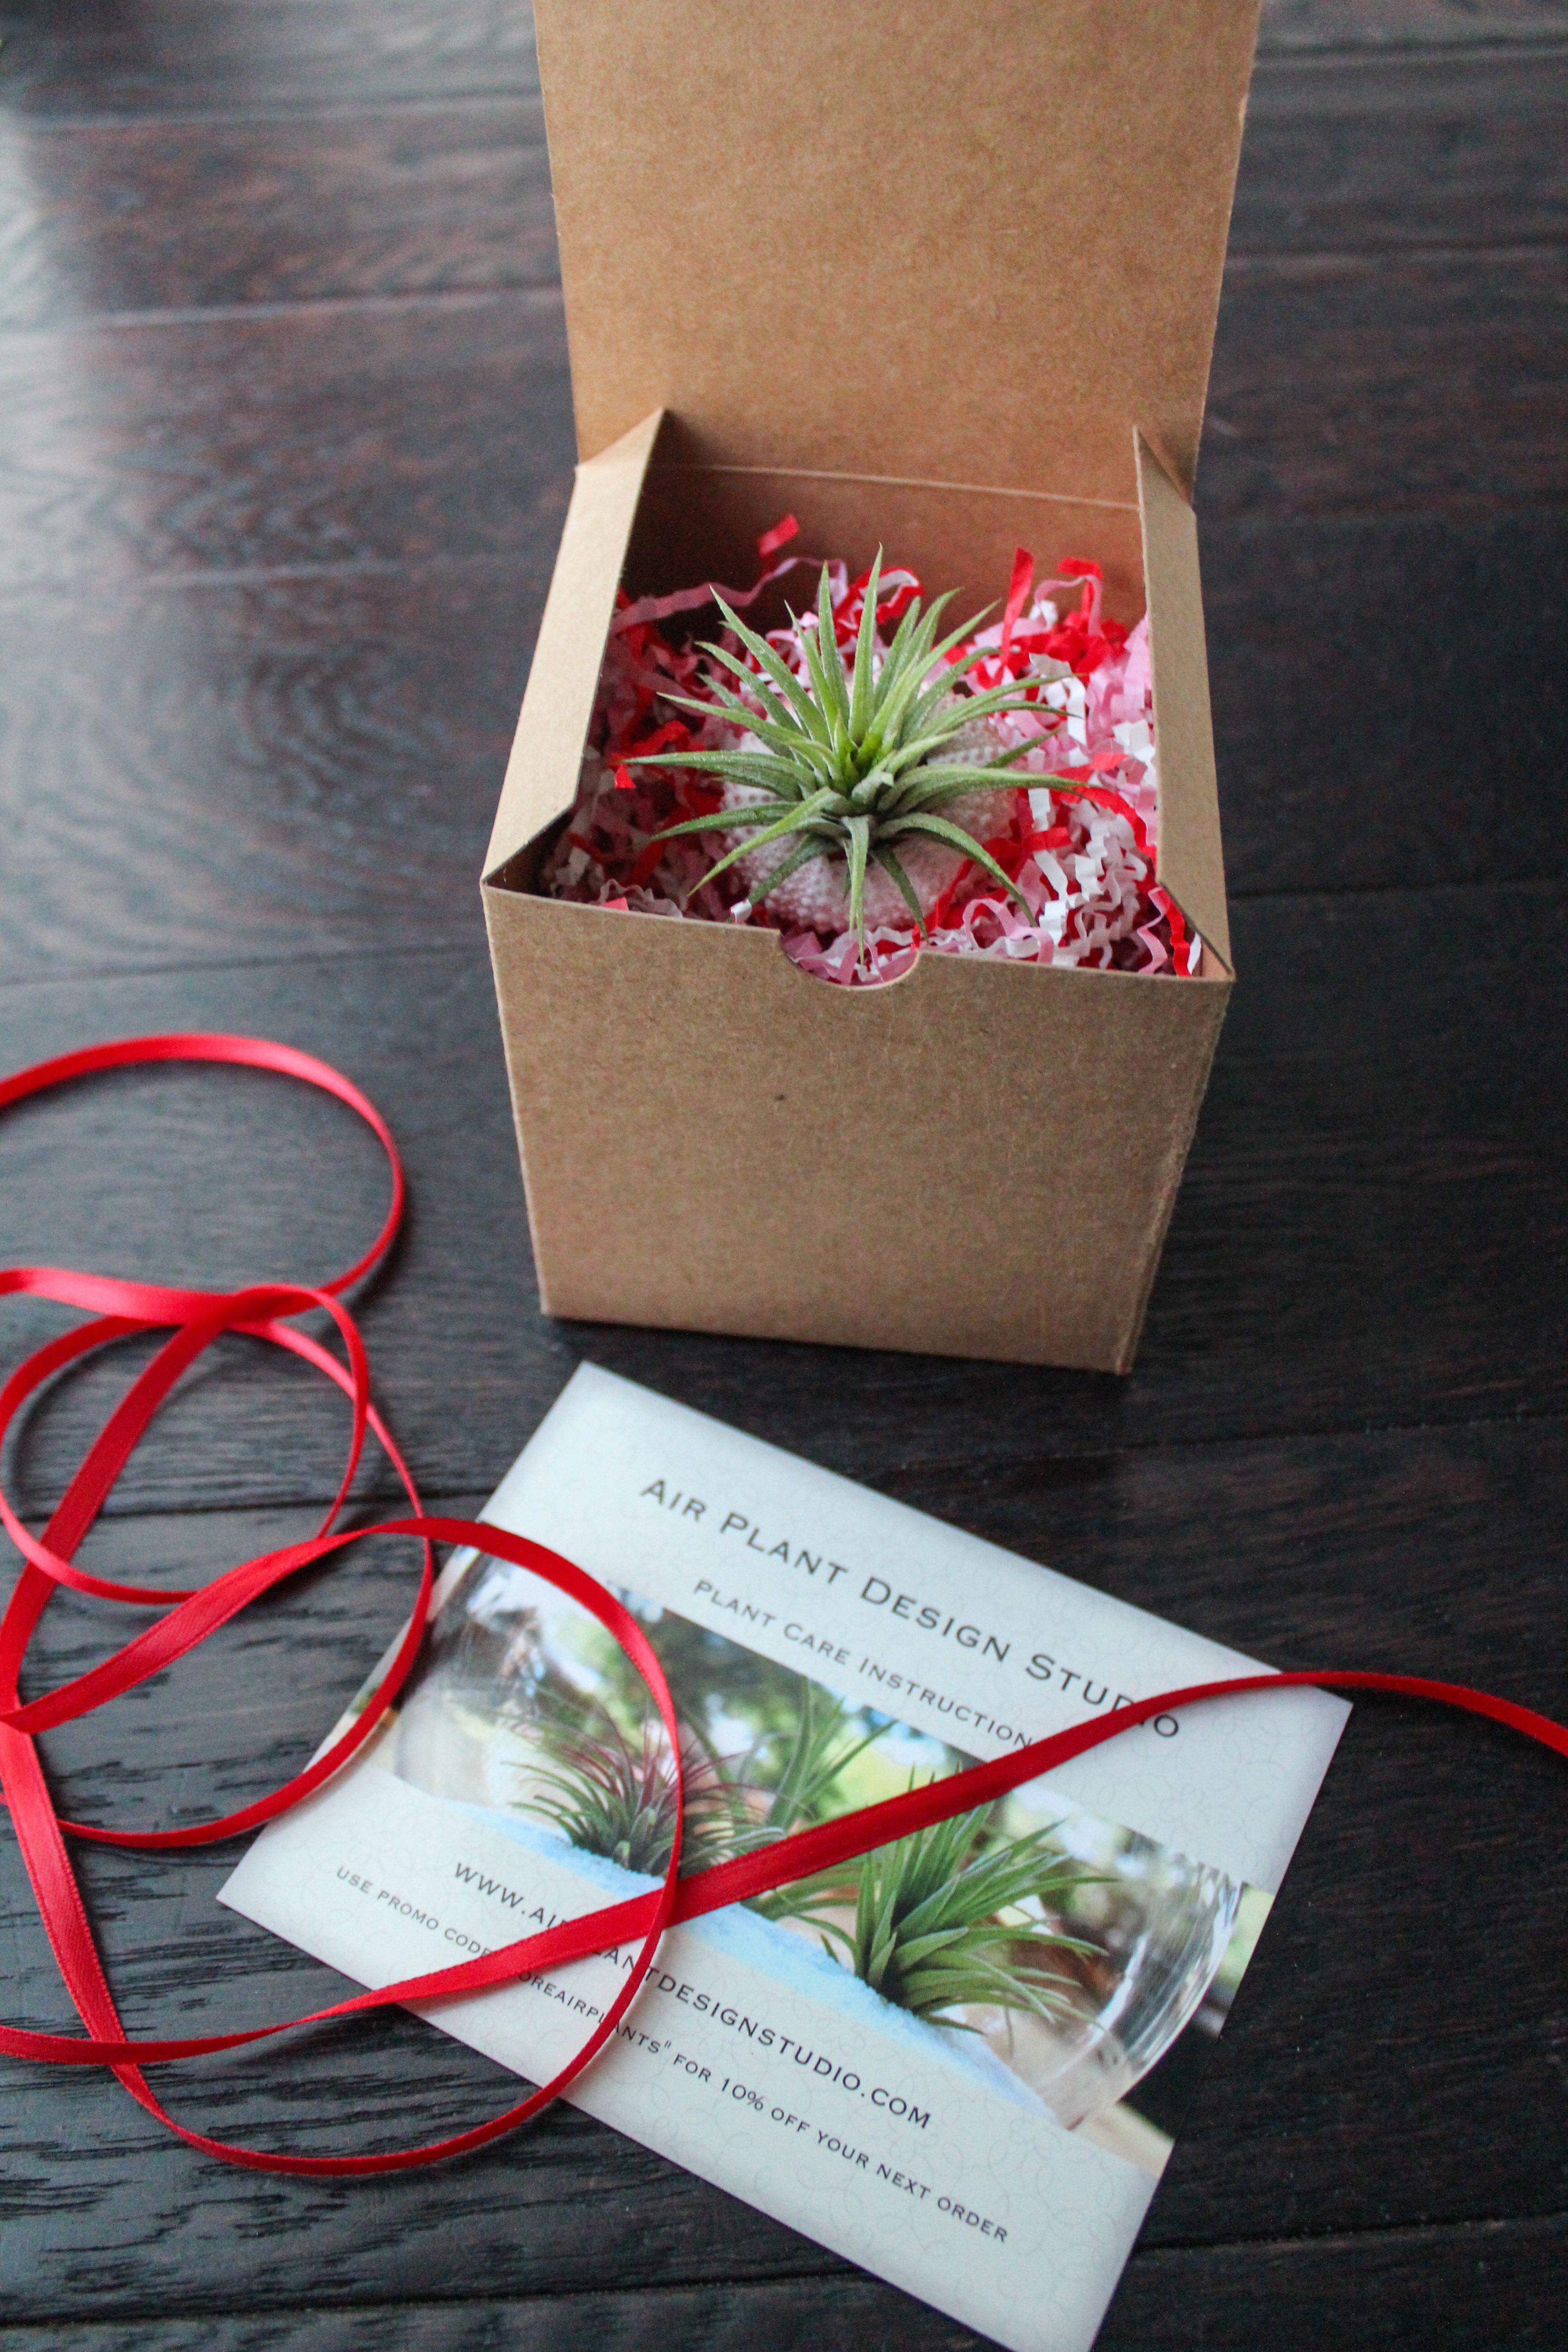 Valentines' Day Air PlantOGram Air plants, Flower